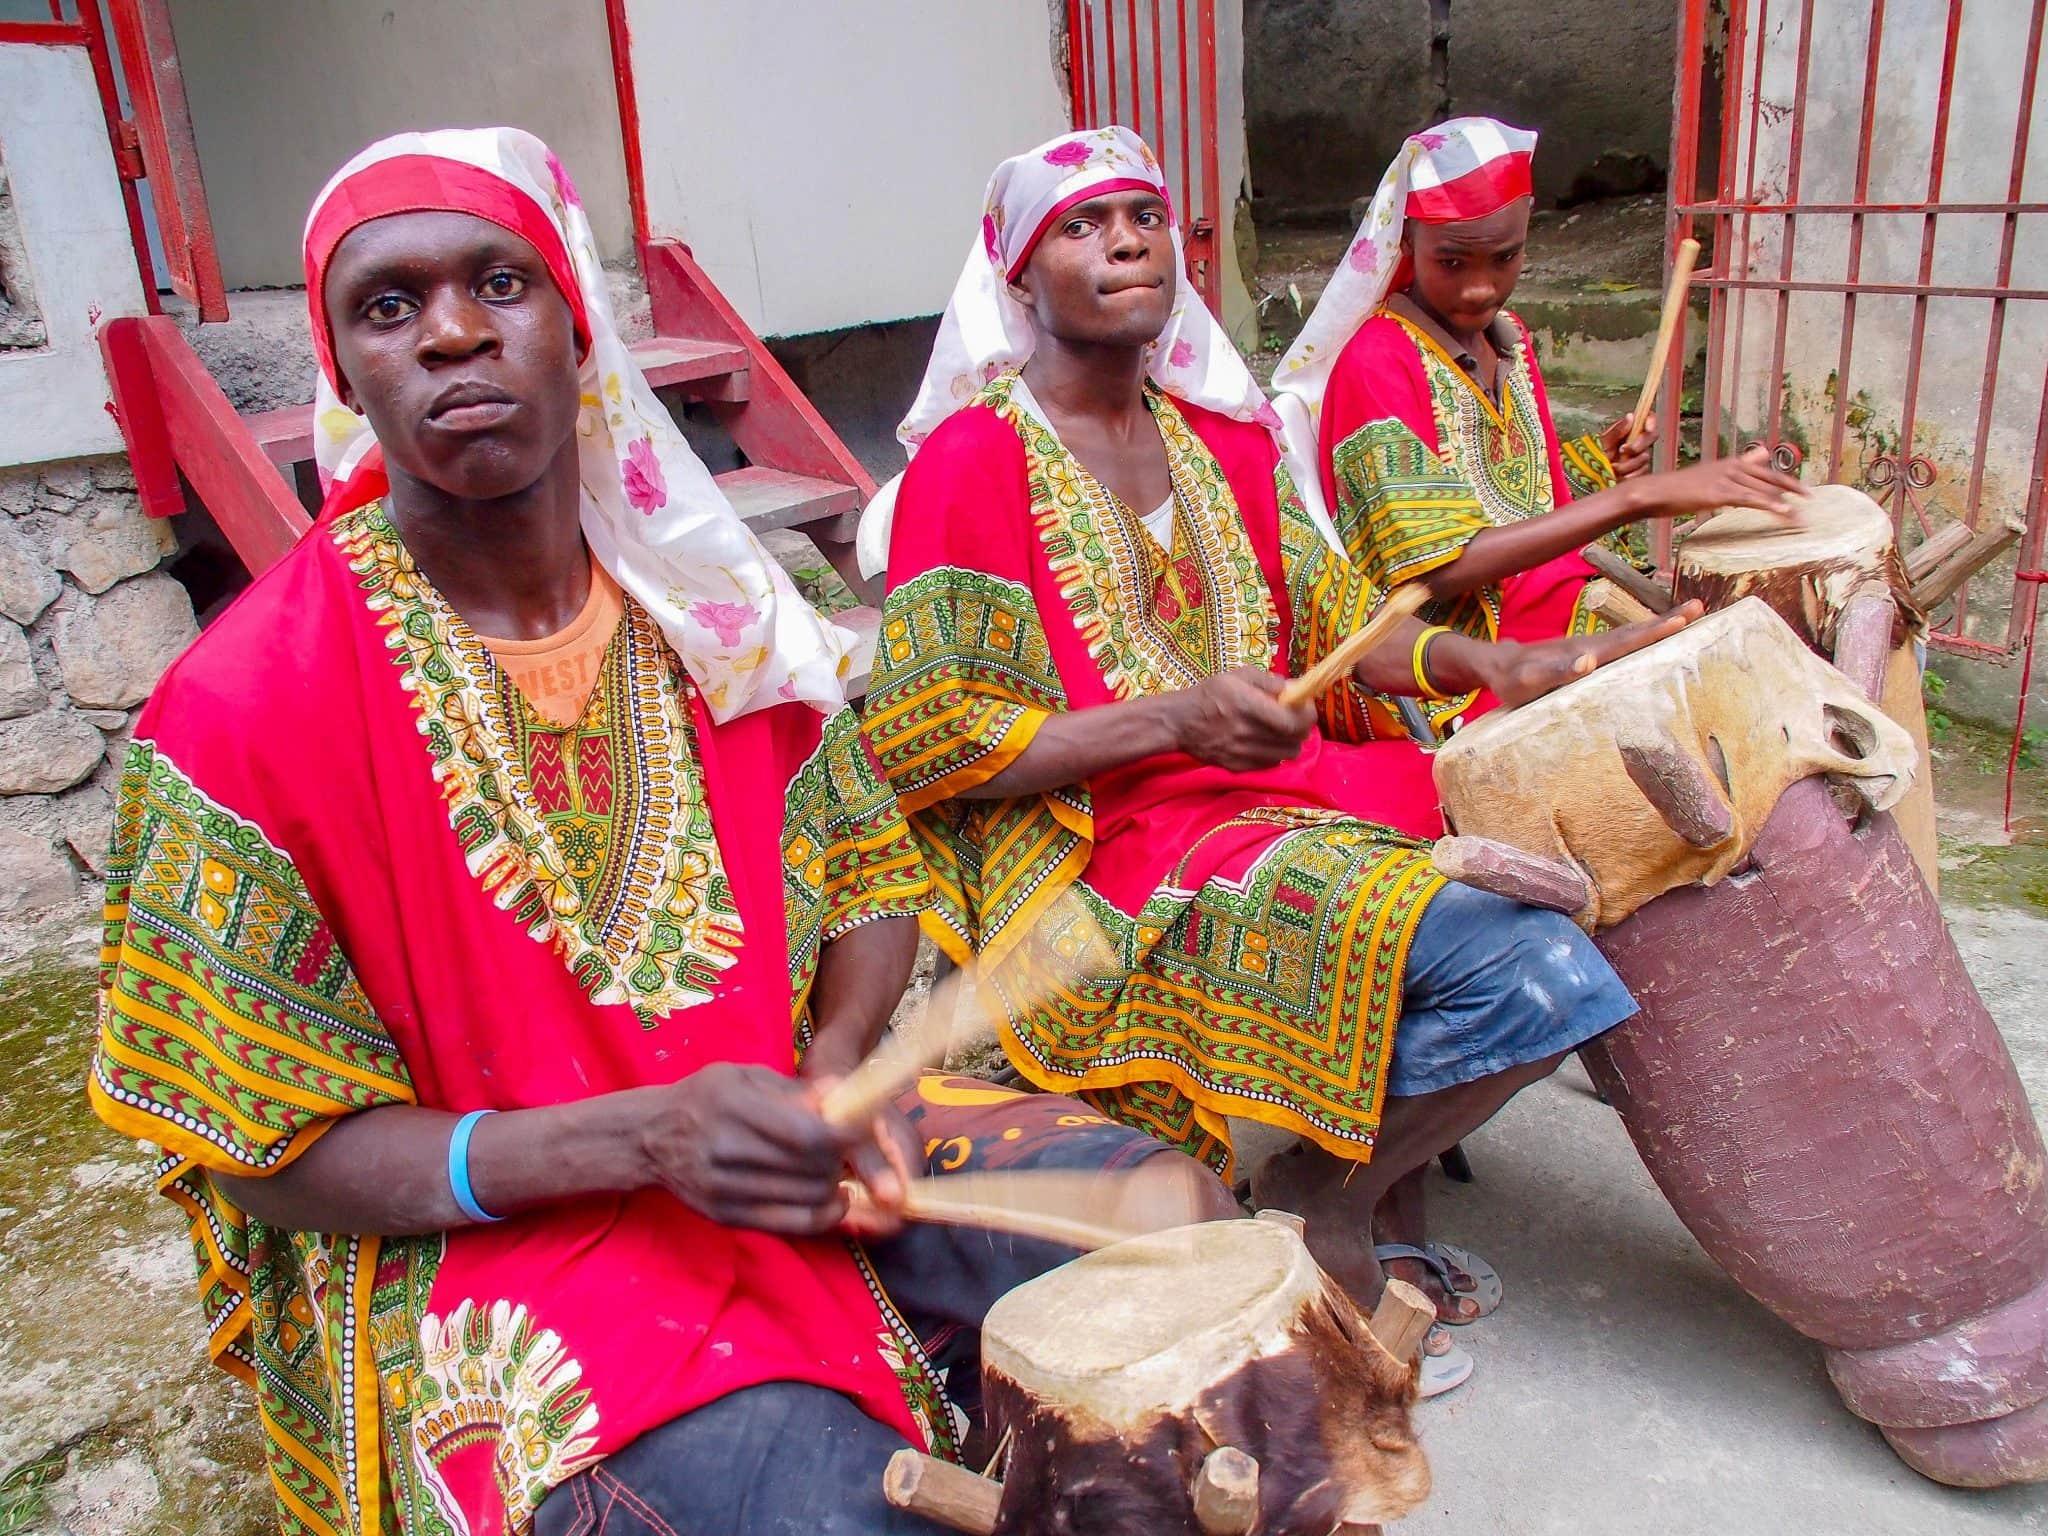 African Drumbeats in Haitian Music